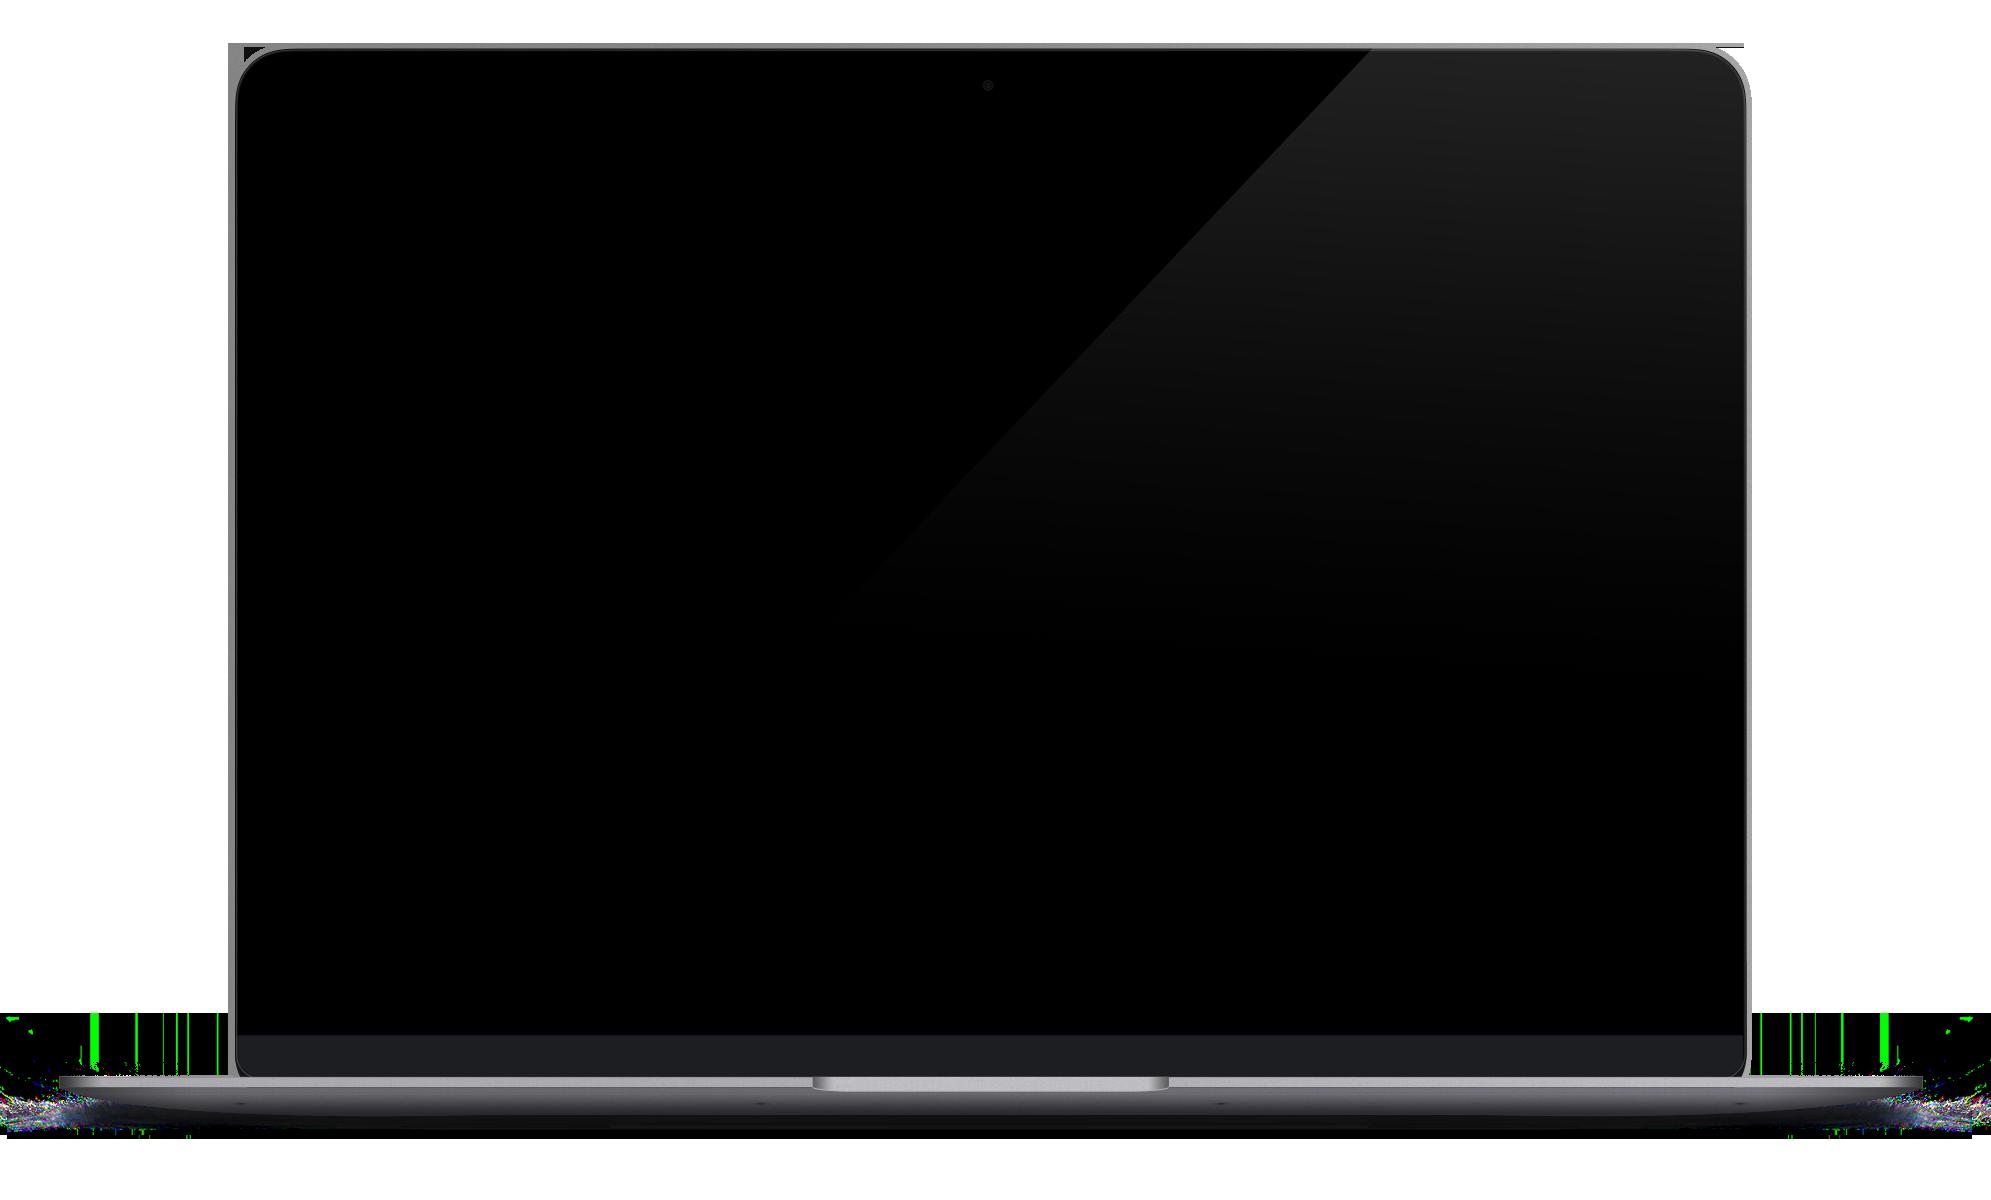 codepilot dashboard mocked up on macbook screen